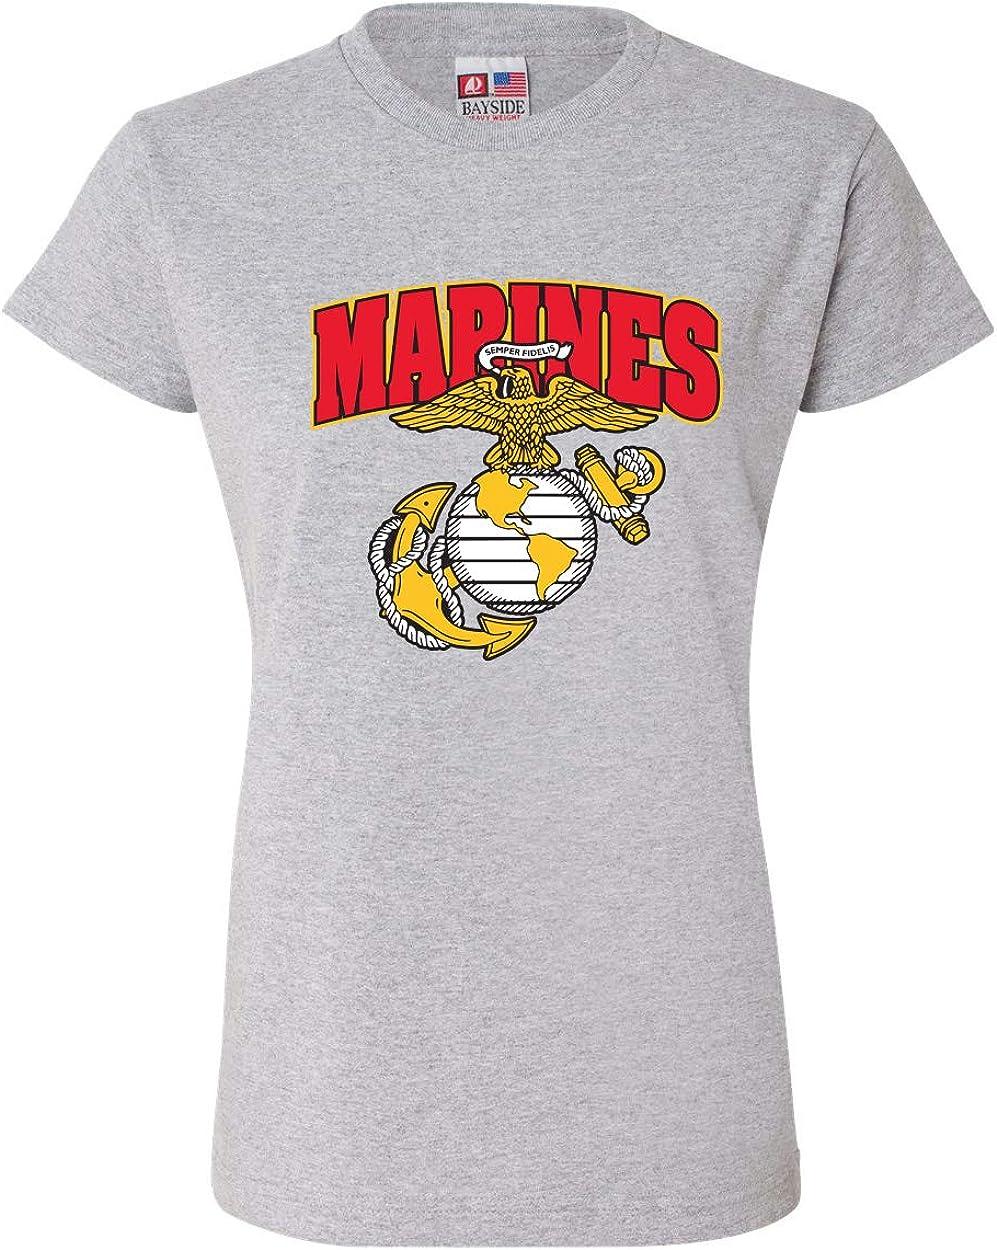 Marines w//Emblem T-Shirt for Women